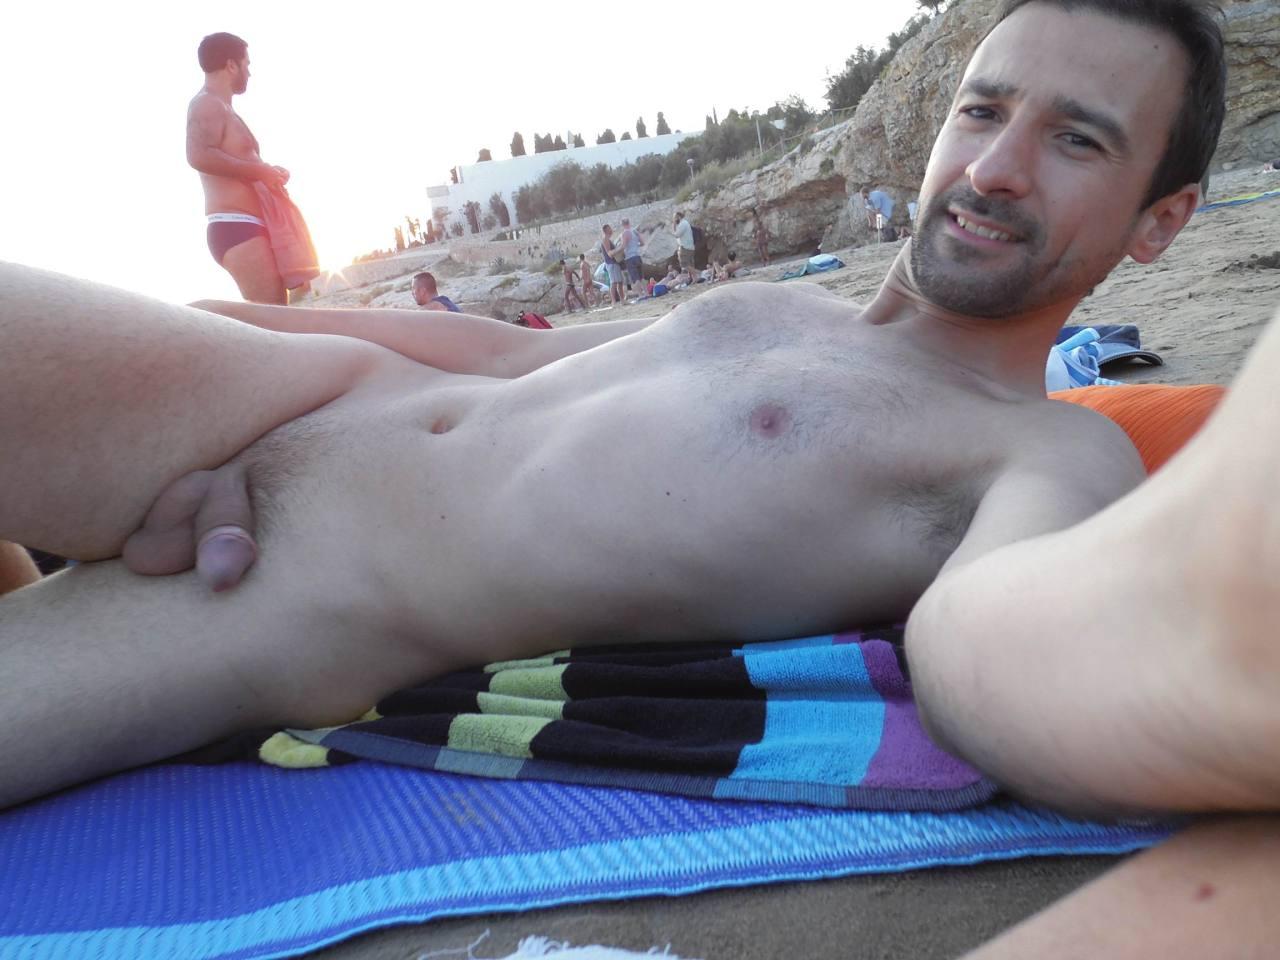 tumblr beach gay sex